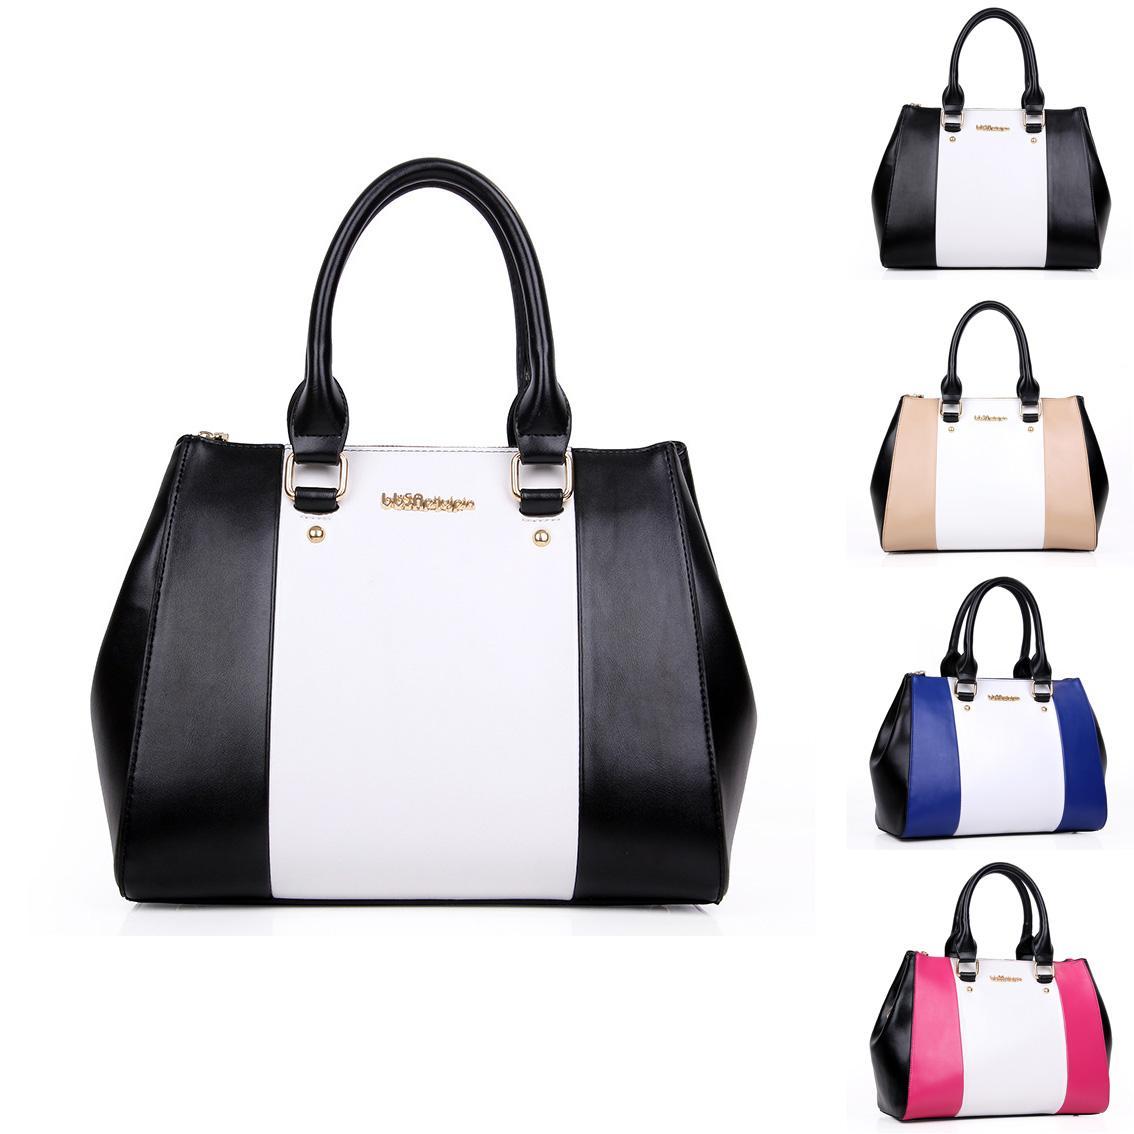 Ladies Large Designer Handbag Fashion Tote Bags Shoulder Bags ...